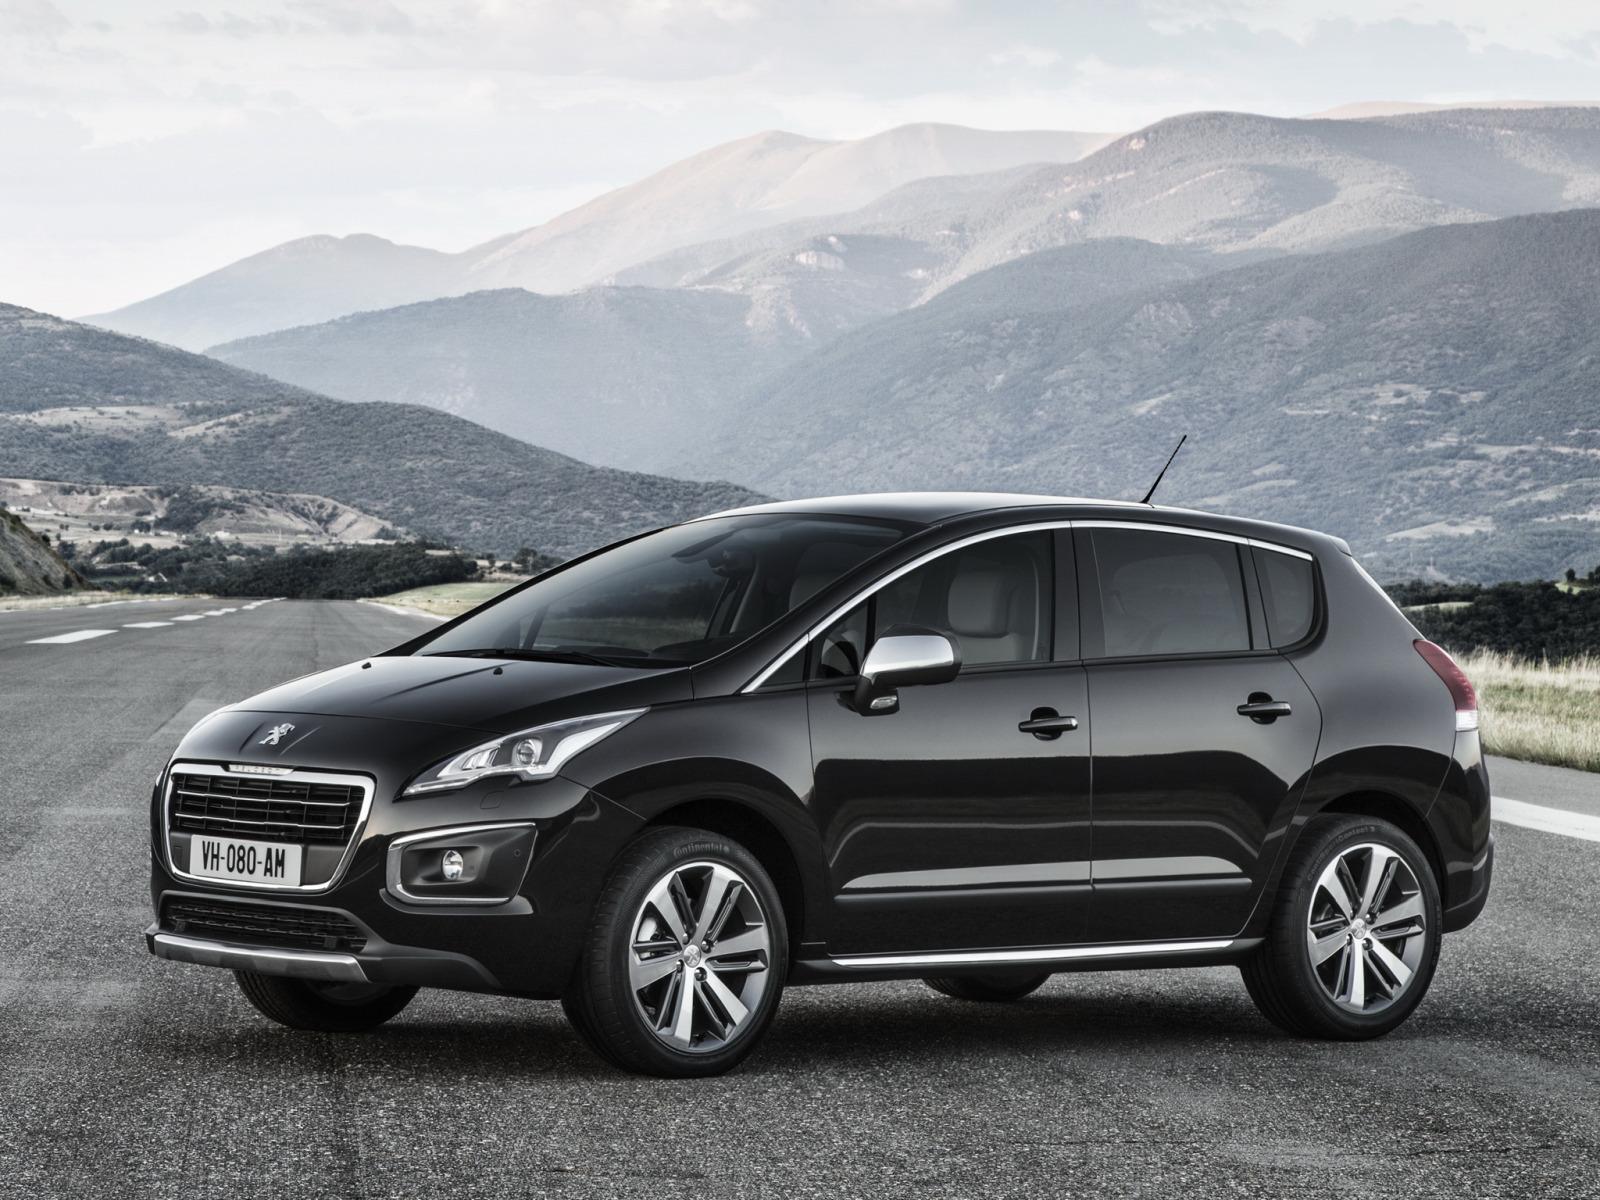 Peugeot 3008 2014, el crossover de Peugeot se actualiza